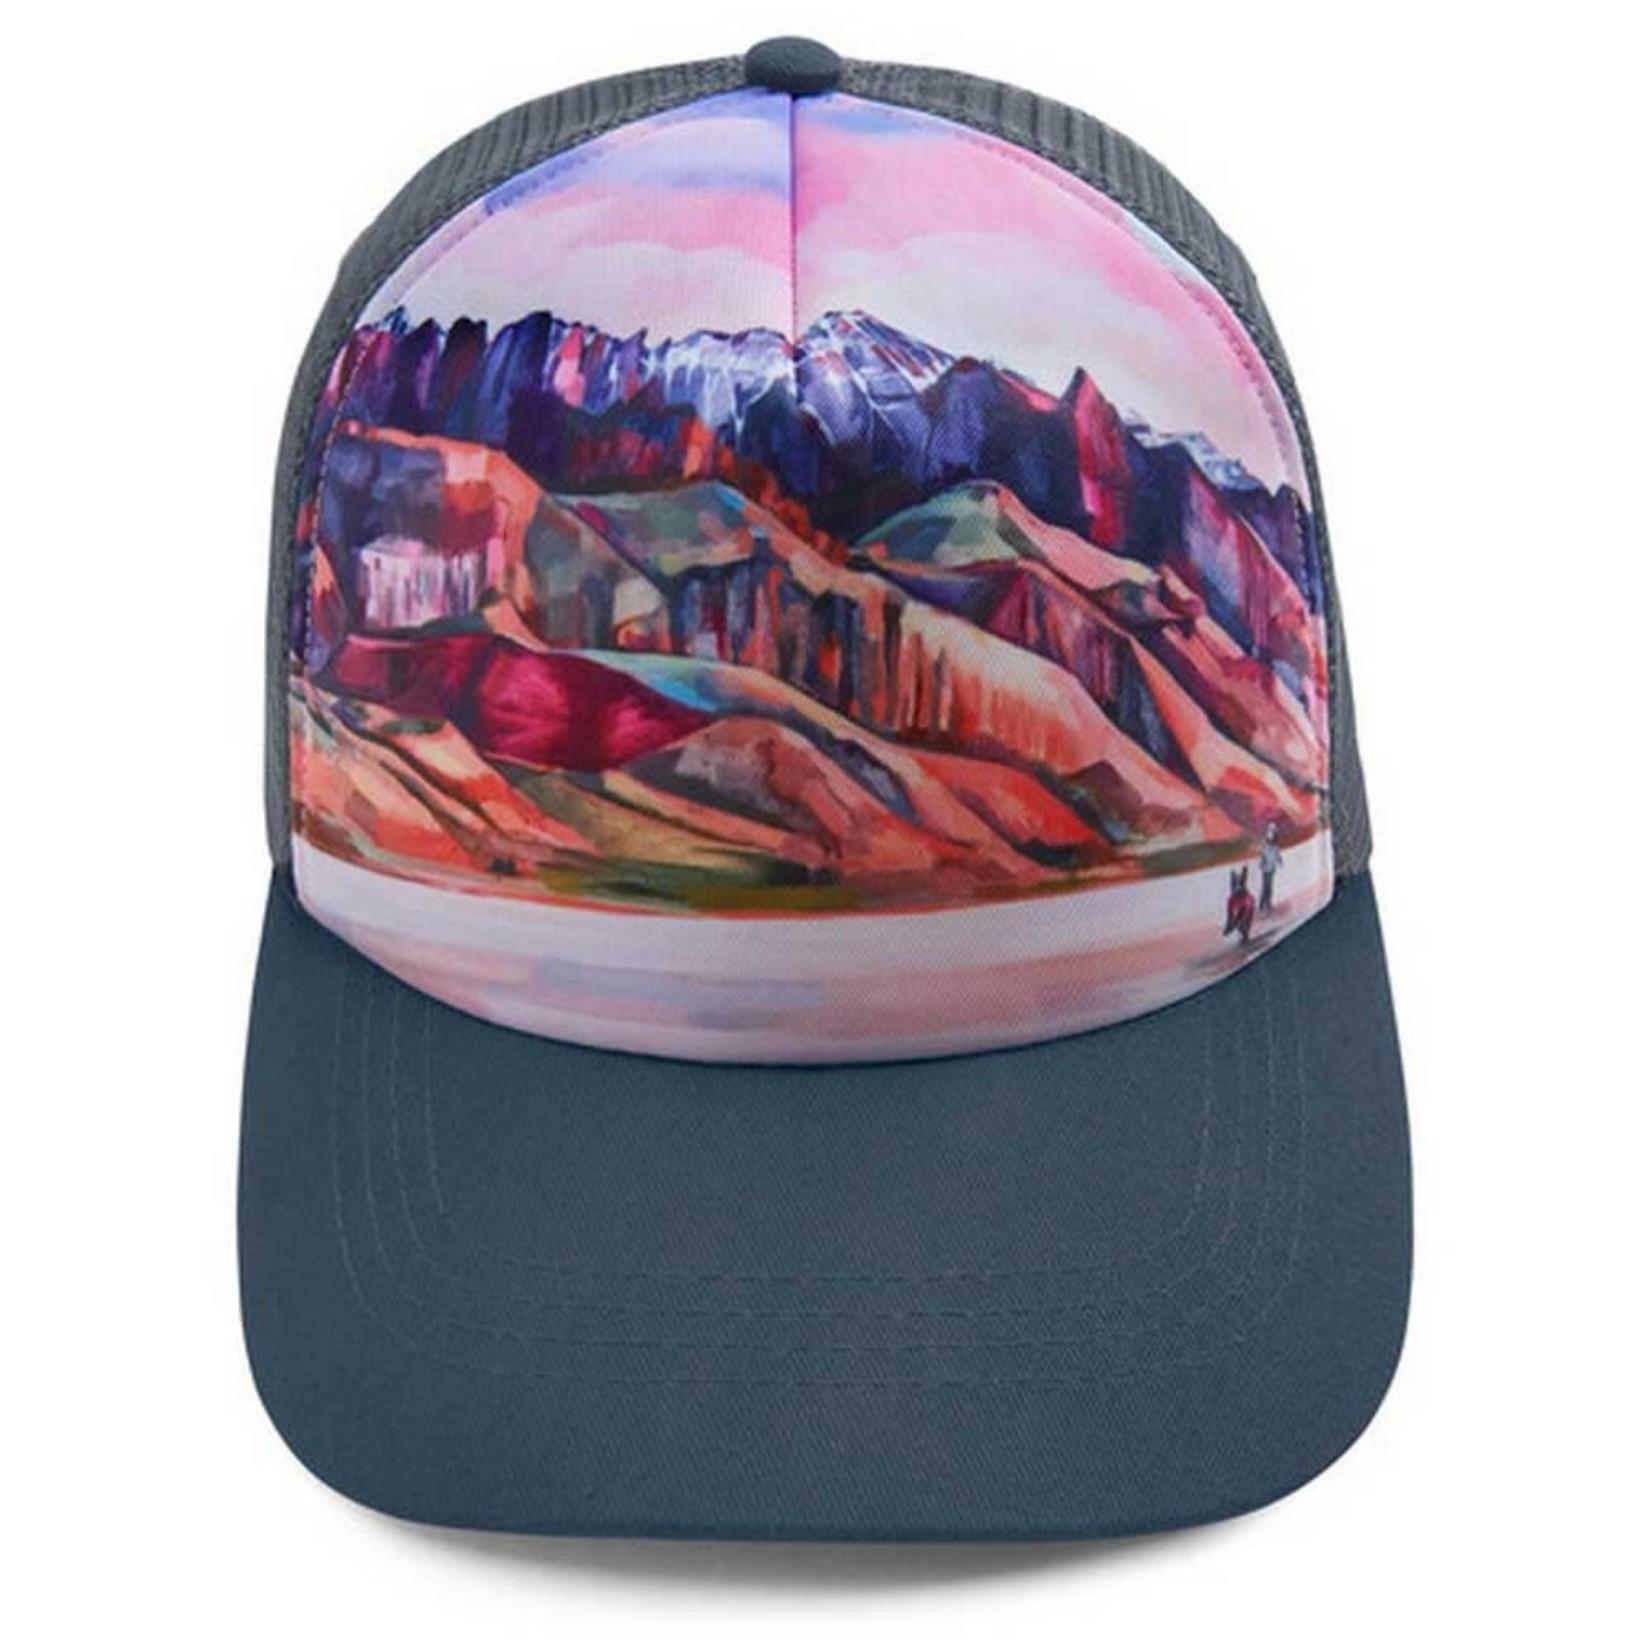 Ruff Wear Ruffwear Artist Series Alvord Desert Hat